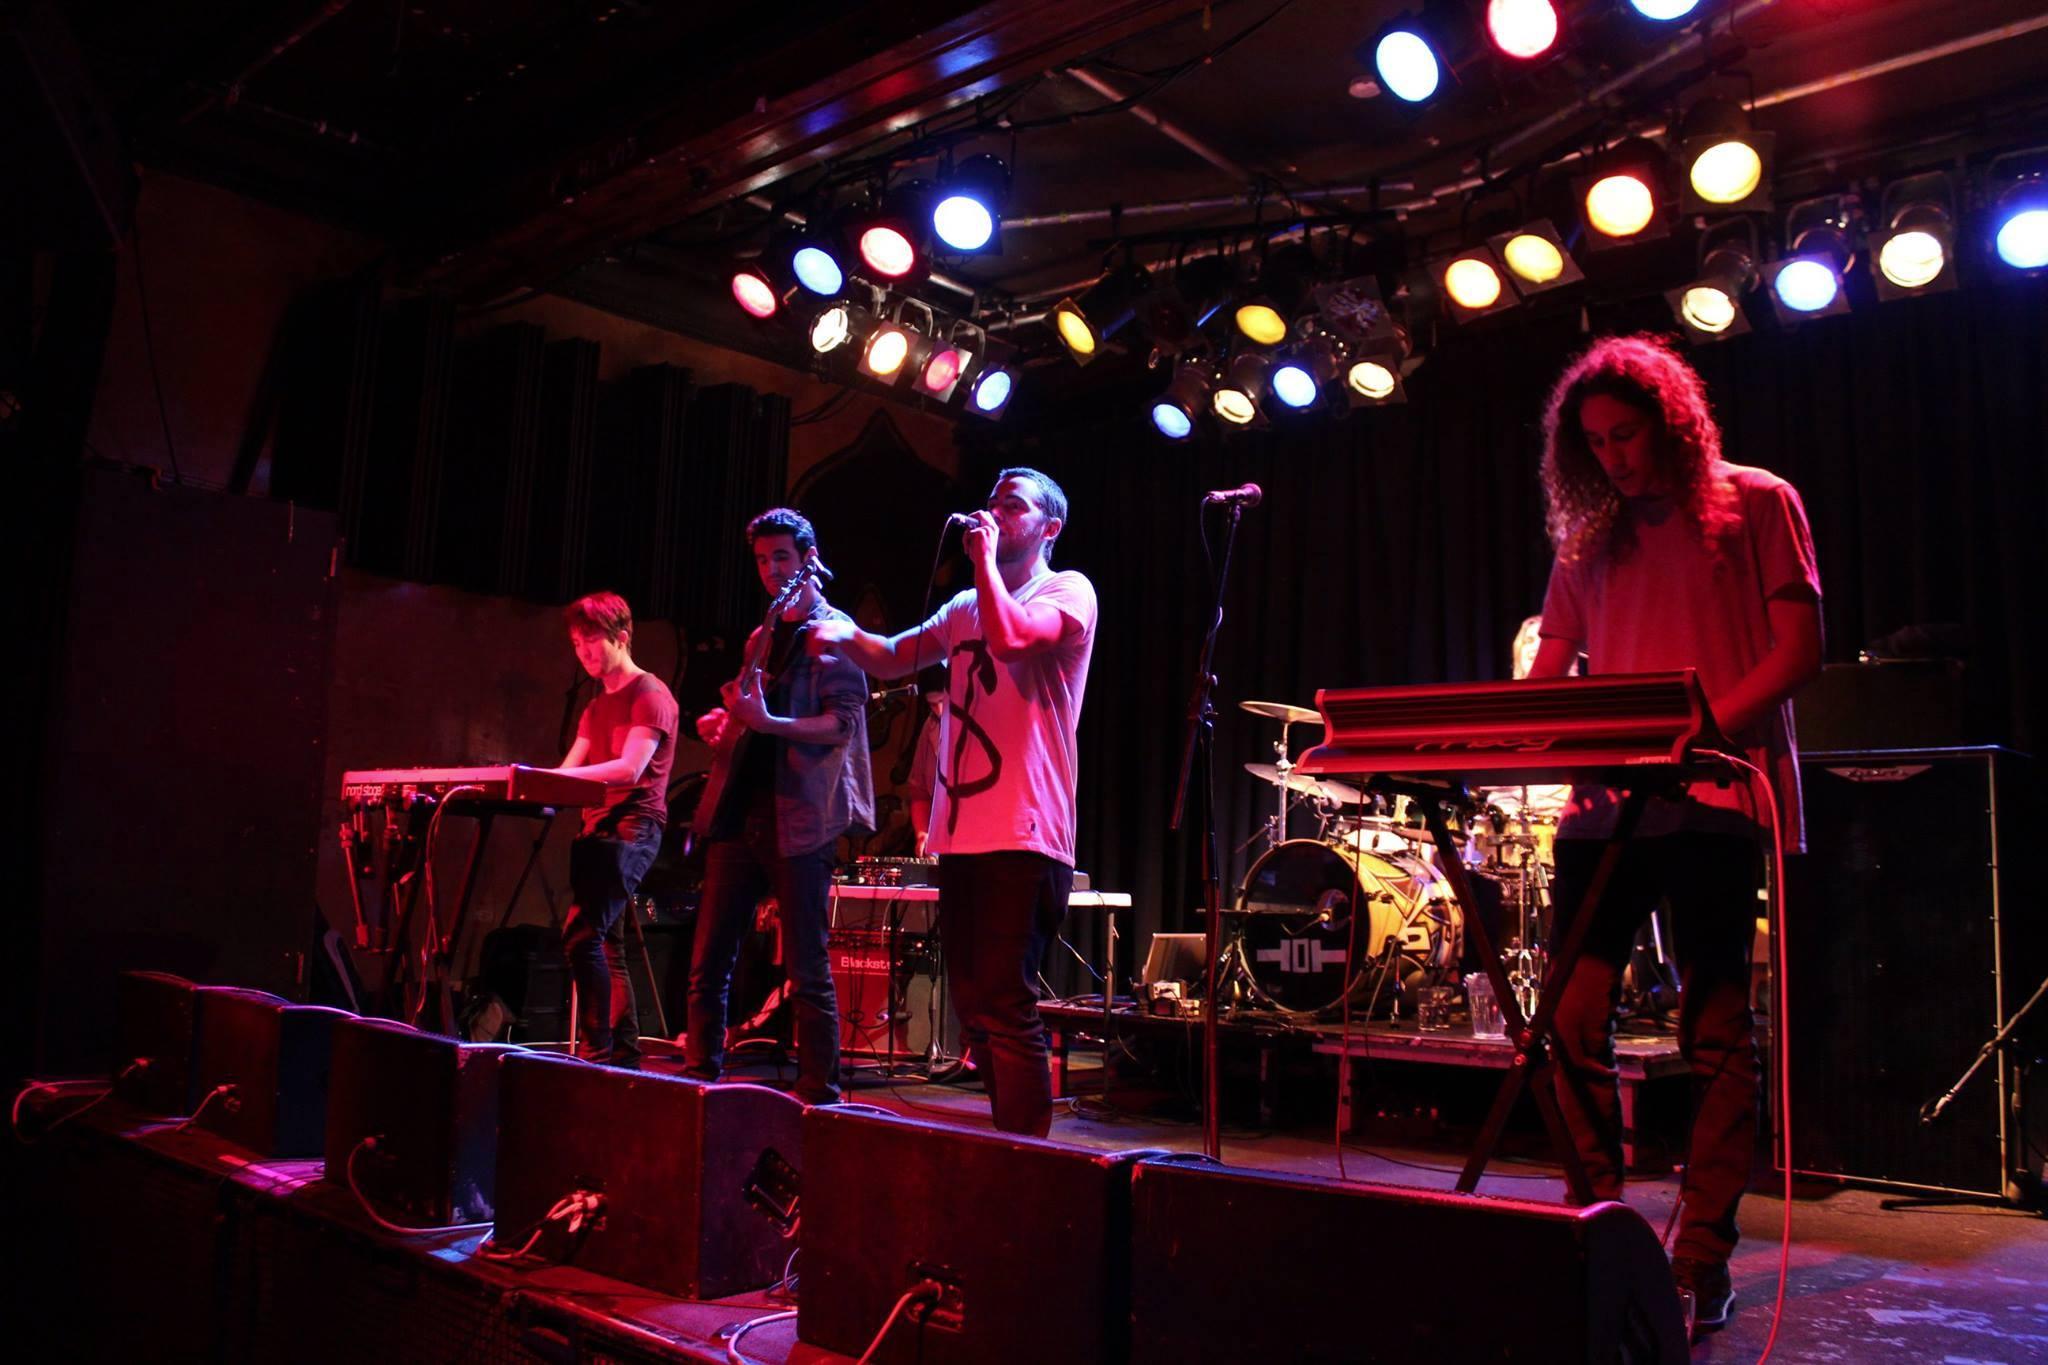 MiniCoop Live On Stage